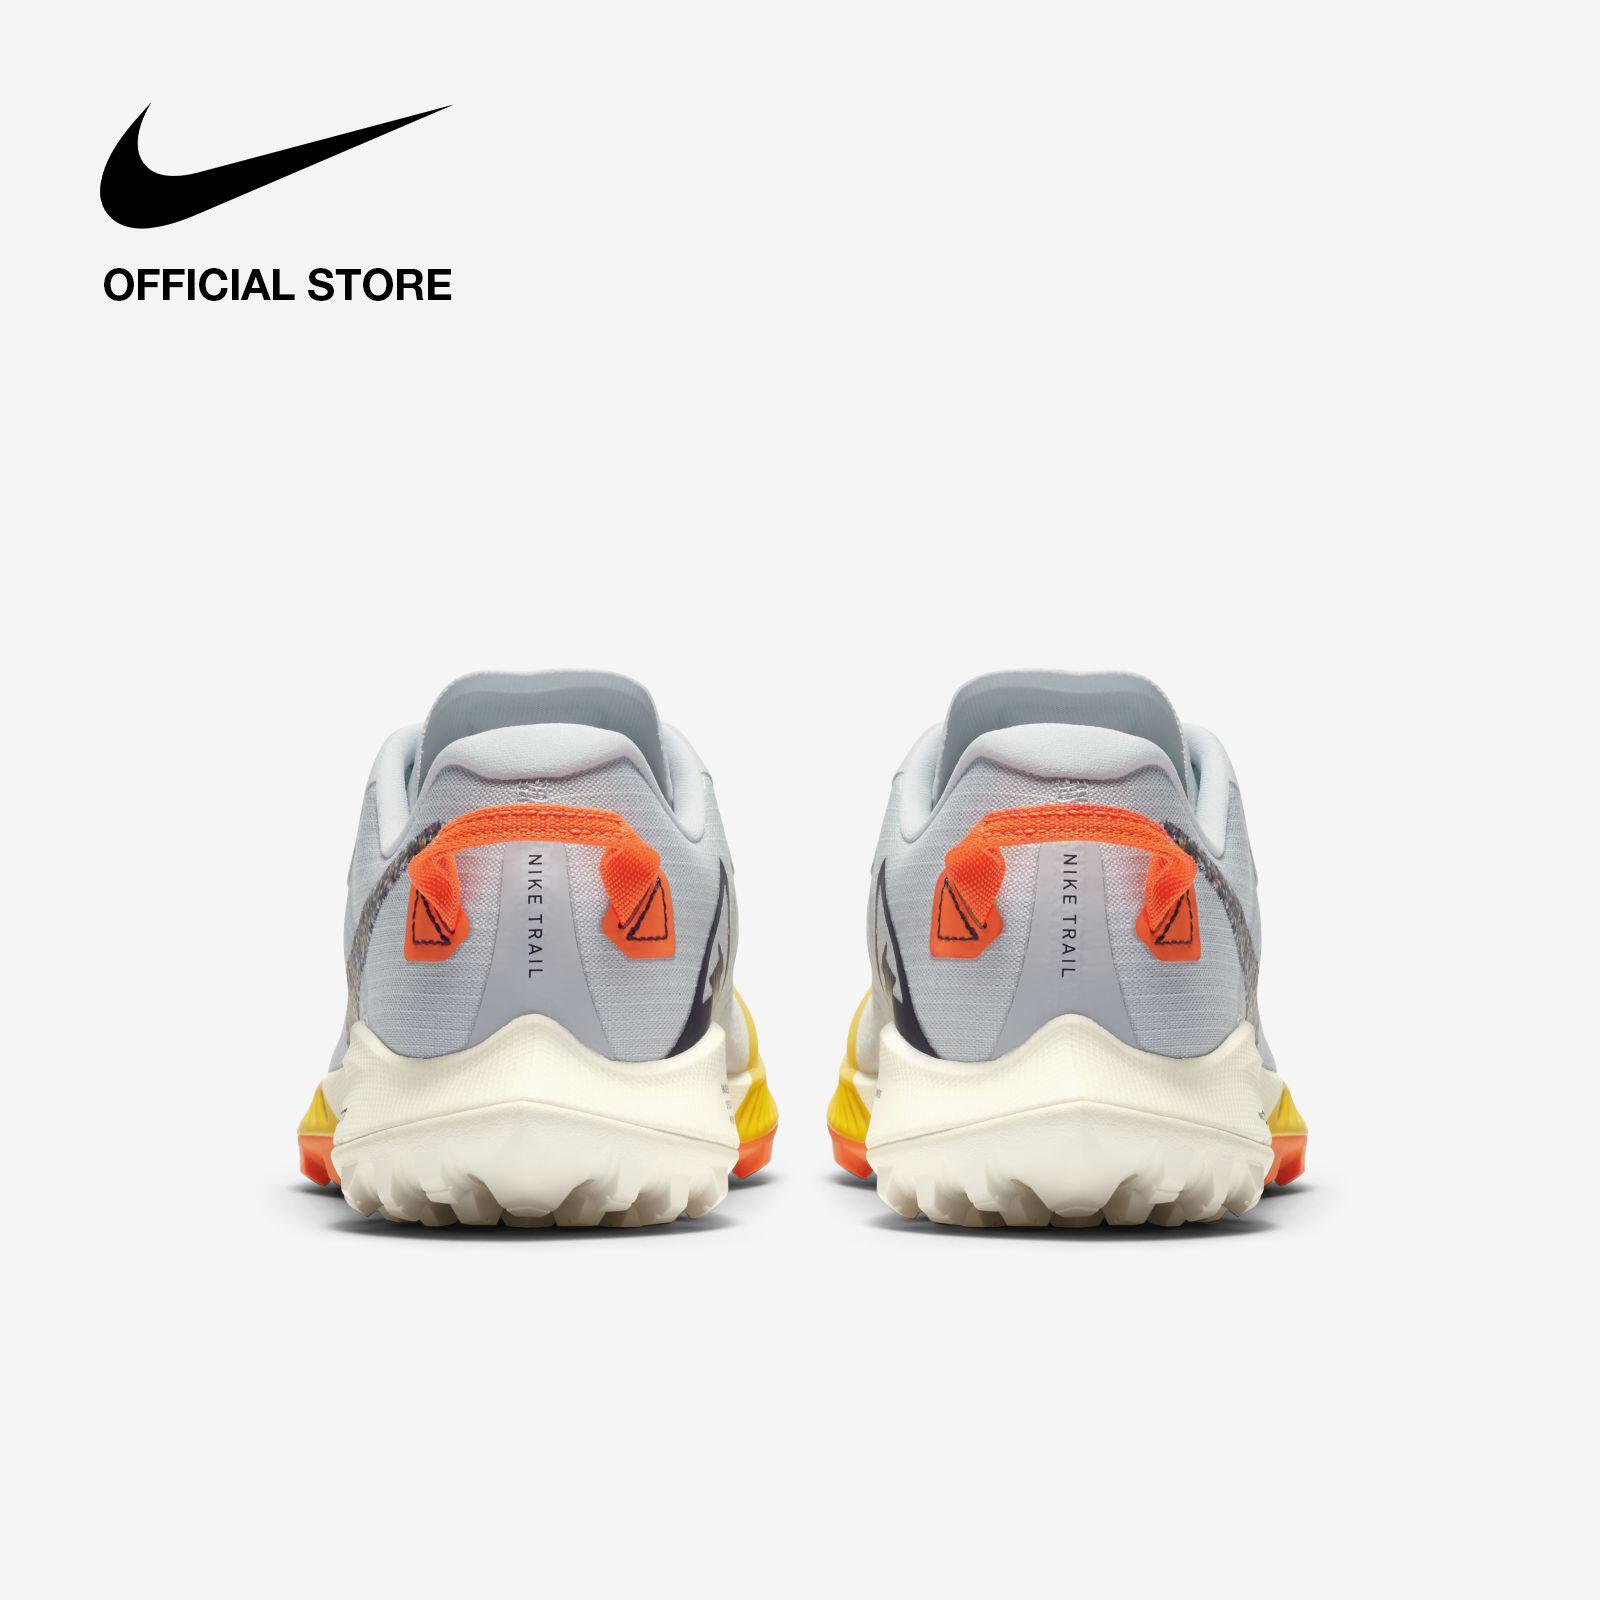 Nike Women's Air Zoom Terra Kiger 6 Trail Running Shoes - Aura ไนกี้ รองเท้าวิ่งเทรลผู้หญิง แอร์ ซูม เทอร่า ไคเกอร์ 6 - สีฟ้า